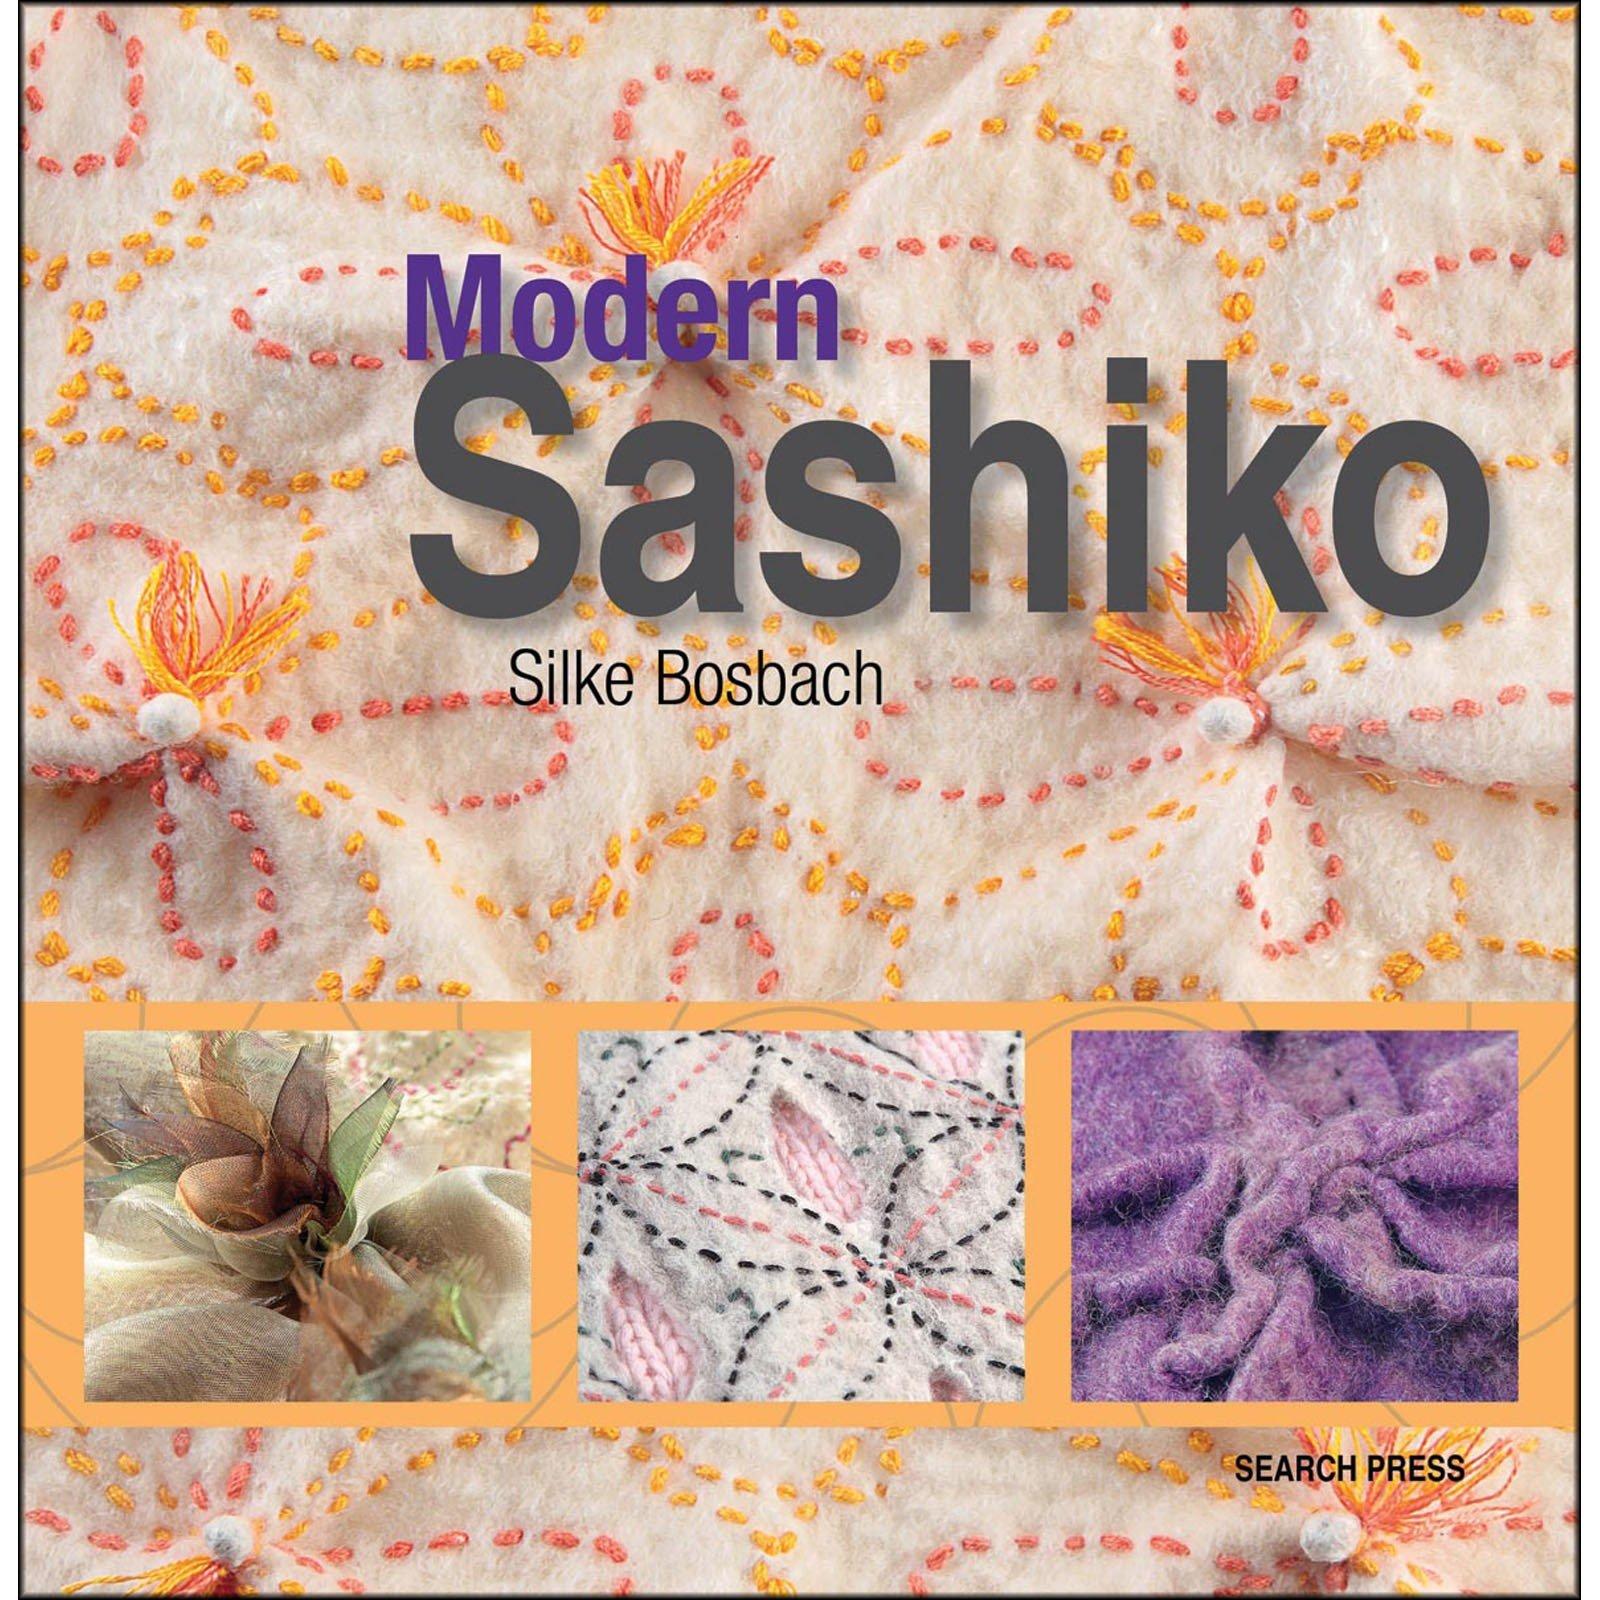 Book. Modern Sashiko by Silke Bosbach